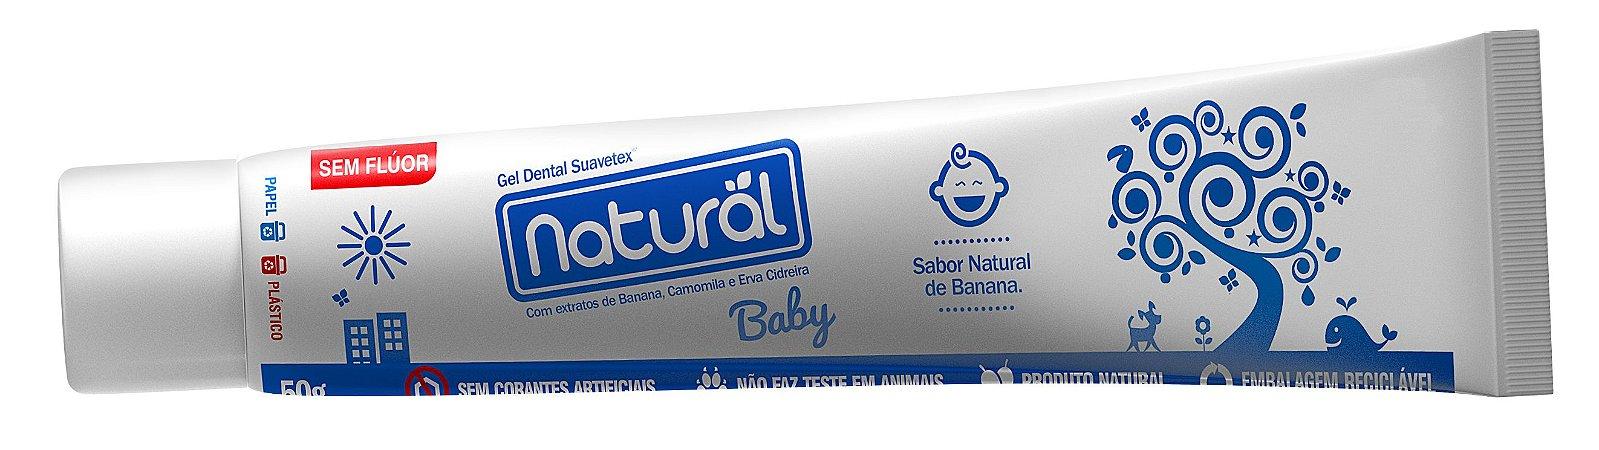 Gel Dental Baby Extratos de Banana, Camomila e Erva-Cidreira 50g - Natural